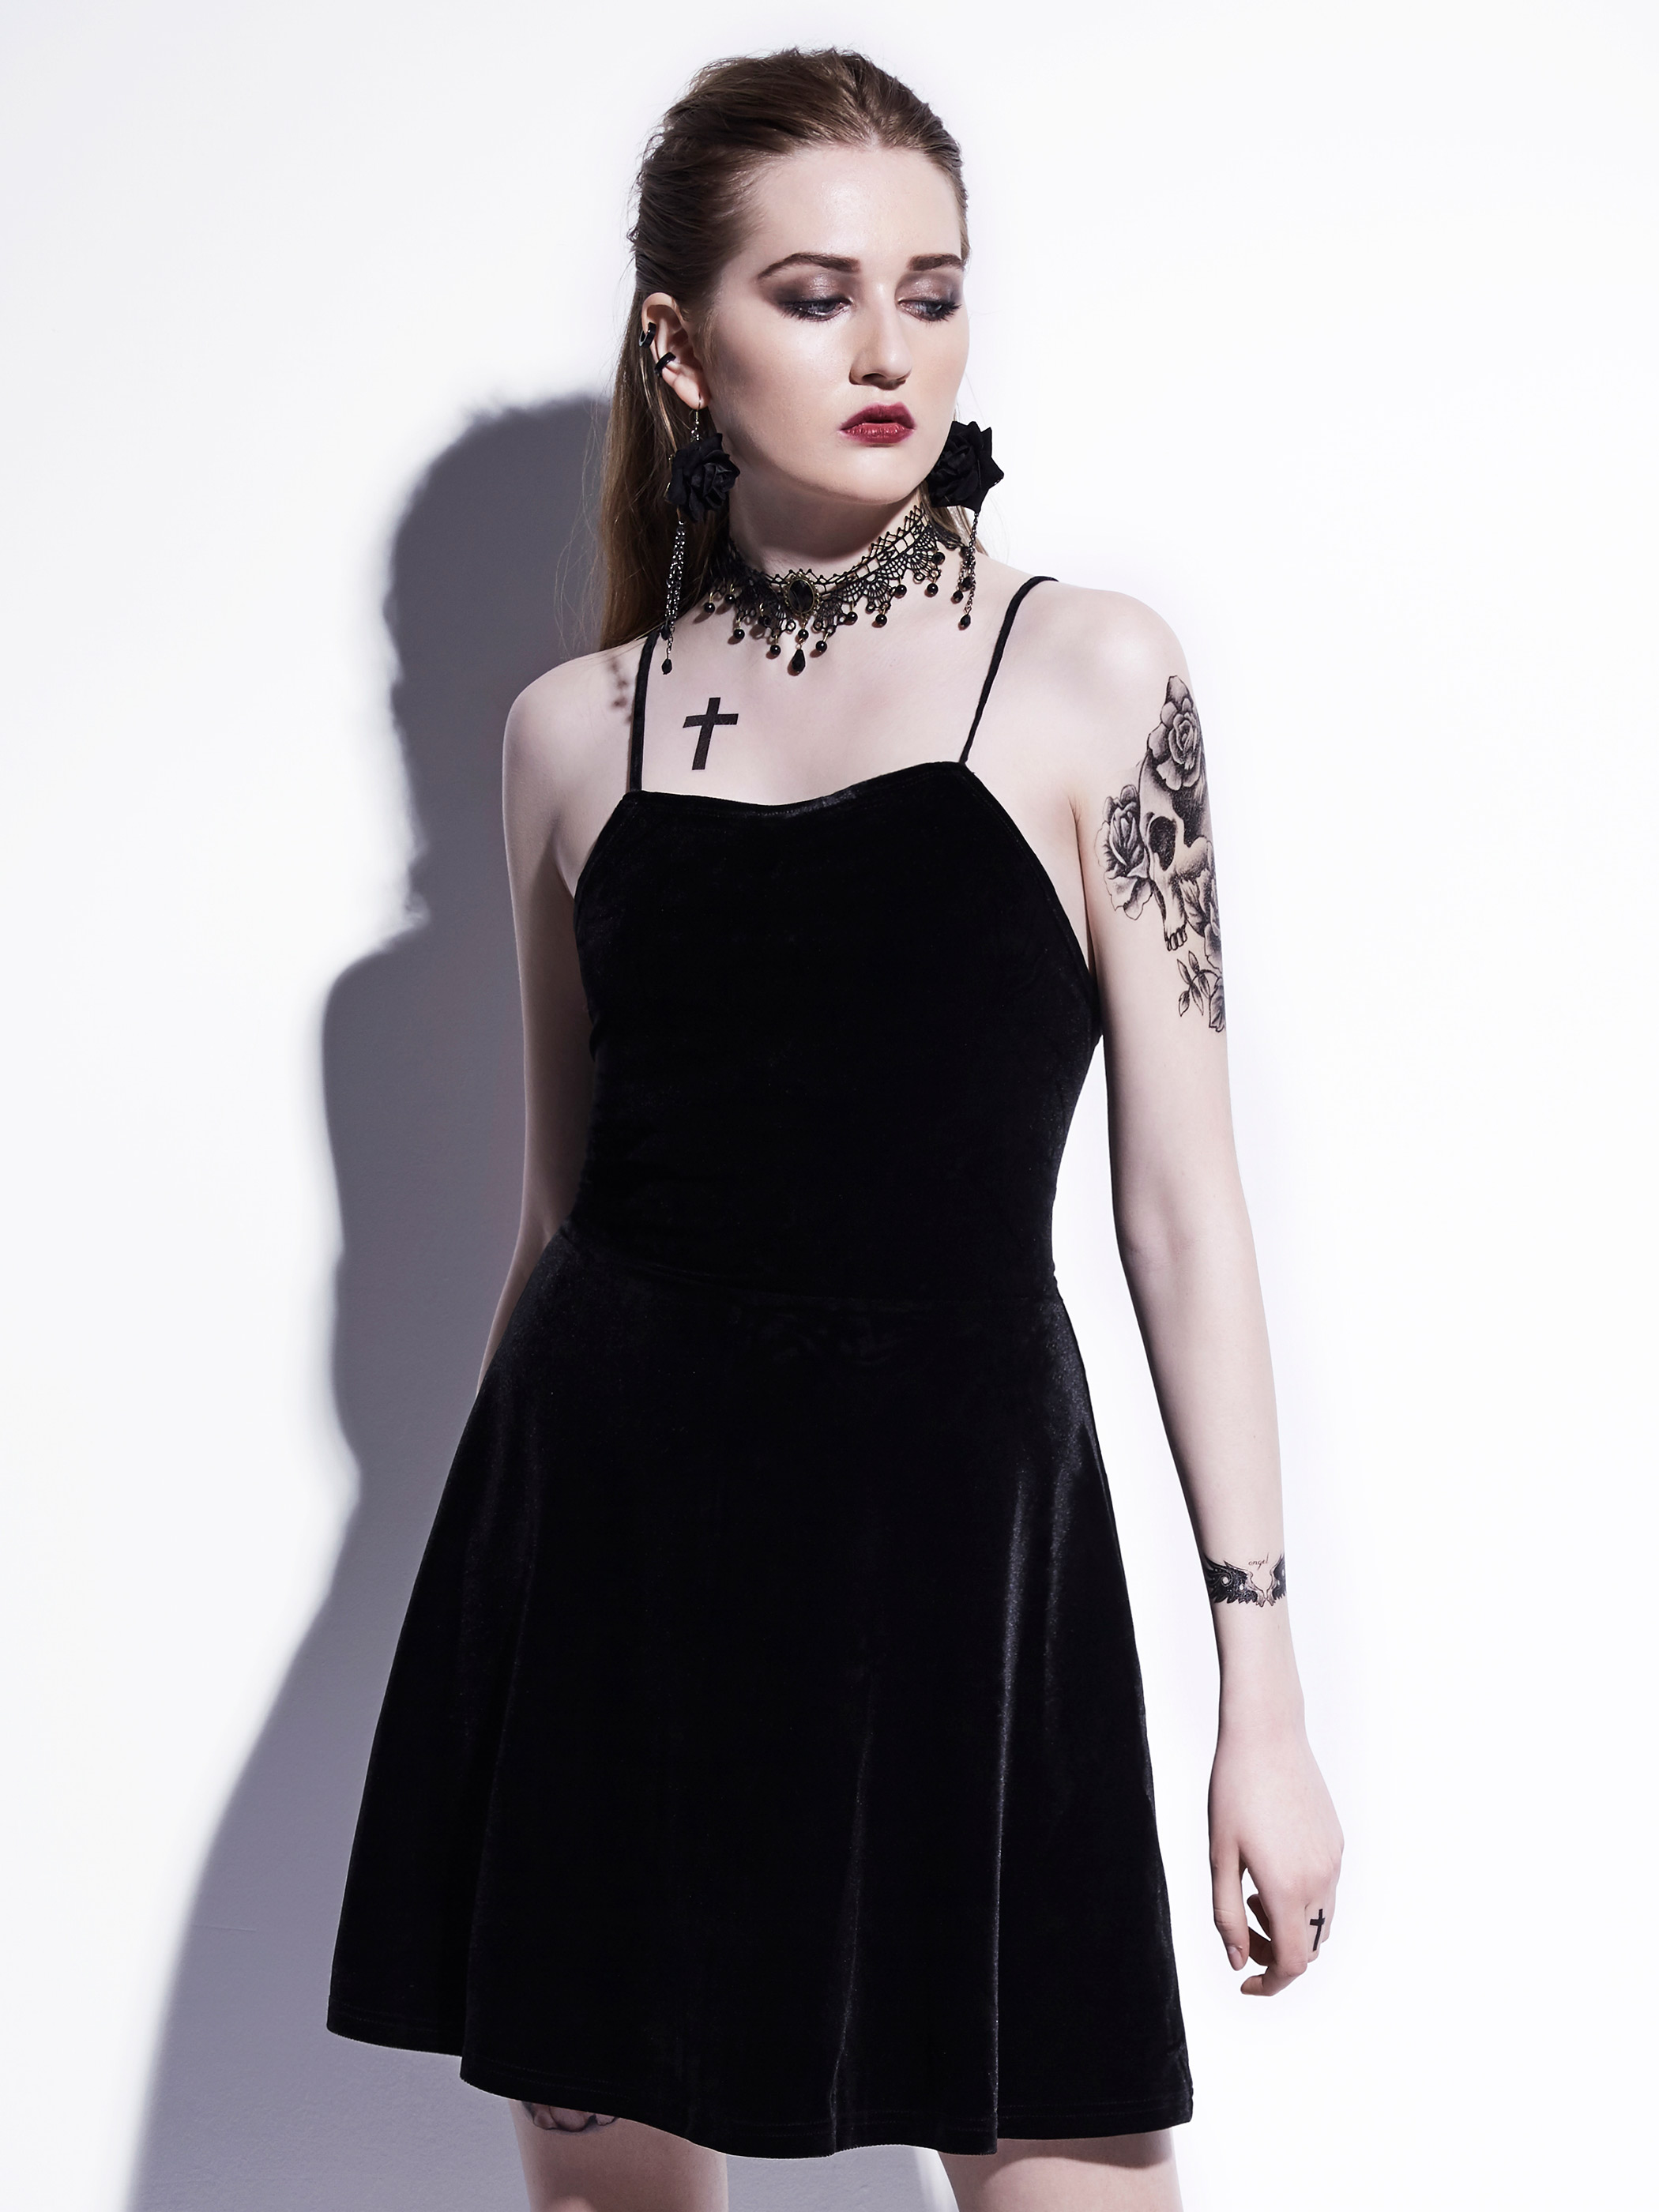 cd70202c28b Gothic Mini Dress 2018 Black Summer Women Sexy Short Dress Velvet Backless  Lace-Up Spaghetti Strap A-Line Goth Dresses. lADPBbCc1cE4a1DNAfTNA8A 960 500